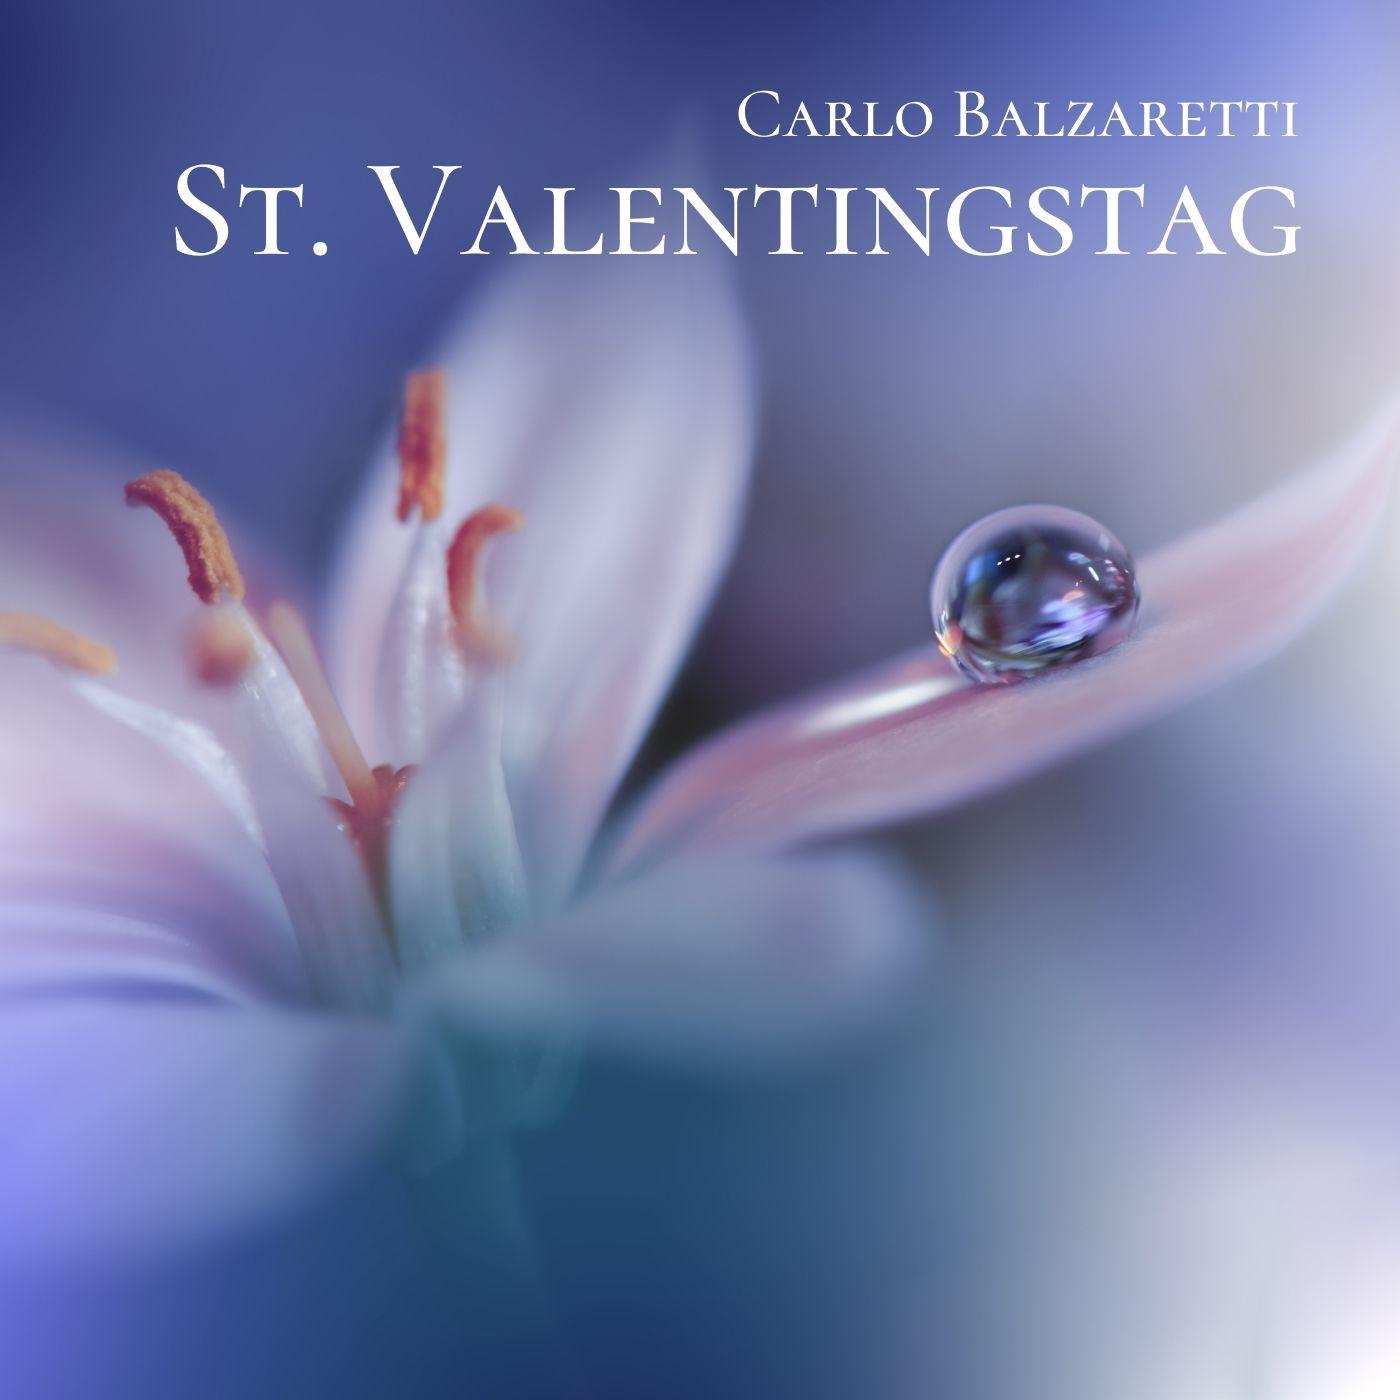 St. Valentingstag